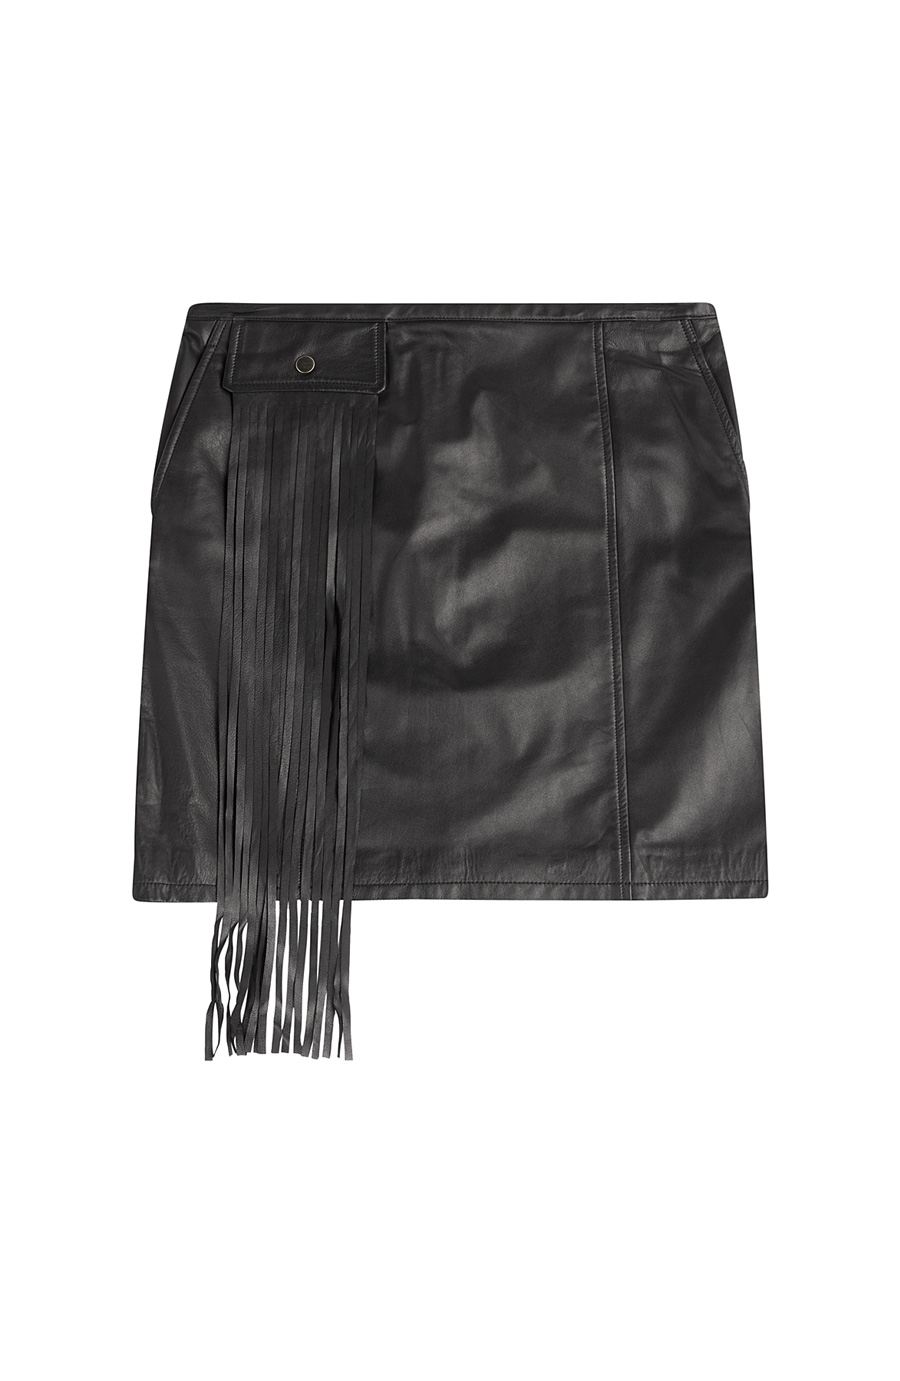 Lambskin Leather Mini Skirt W/ Fringe Pocket